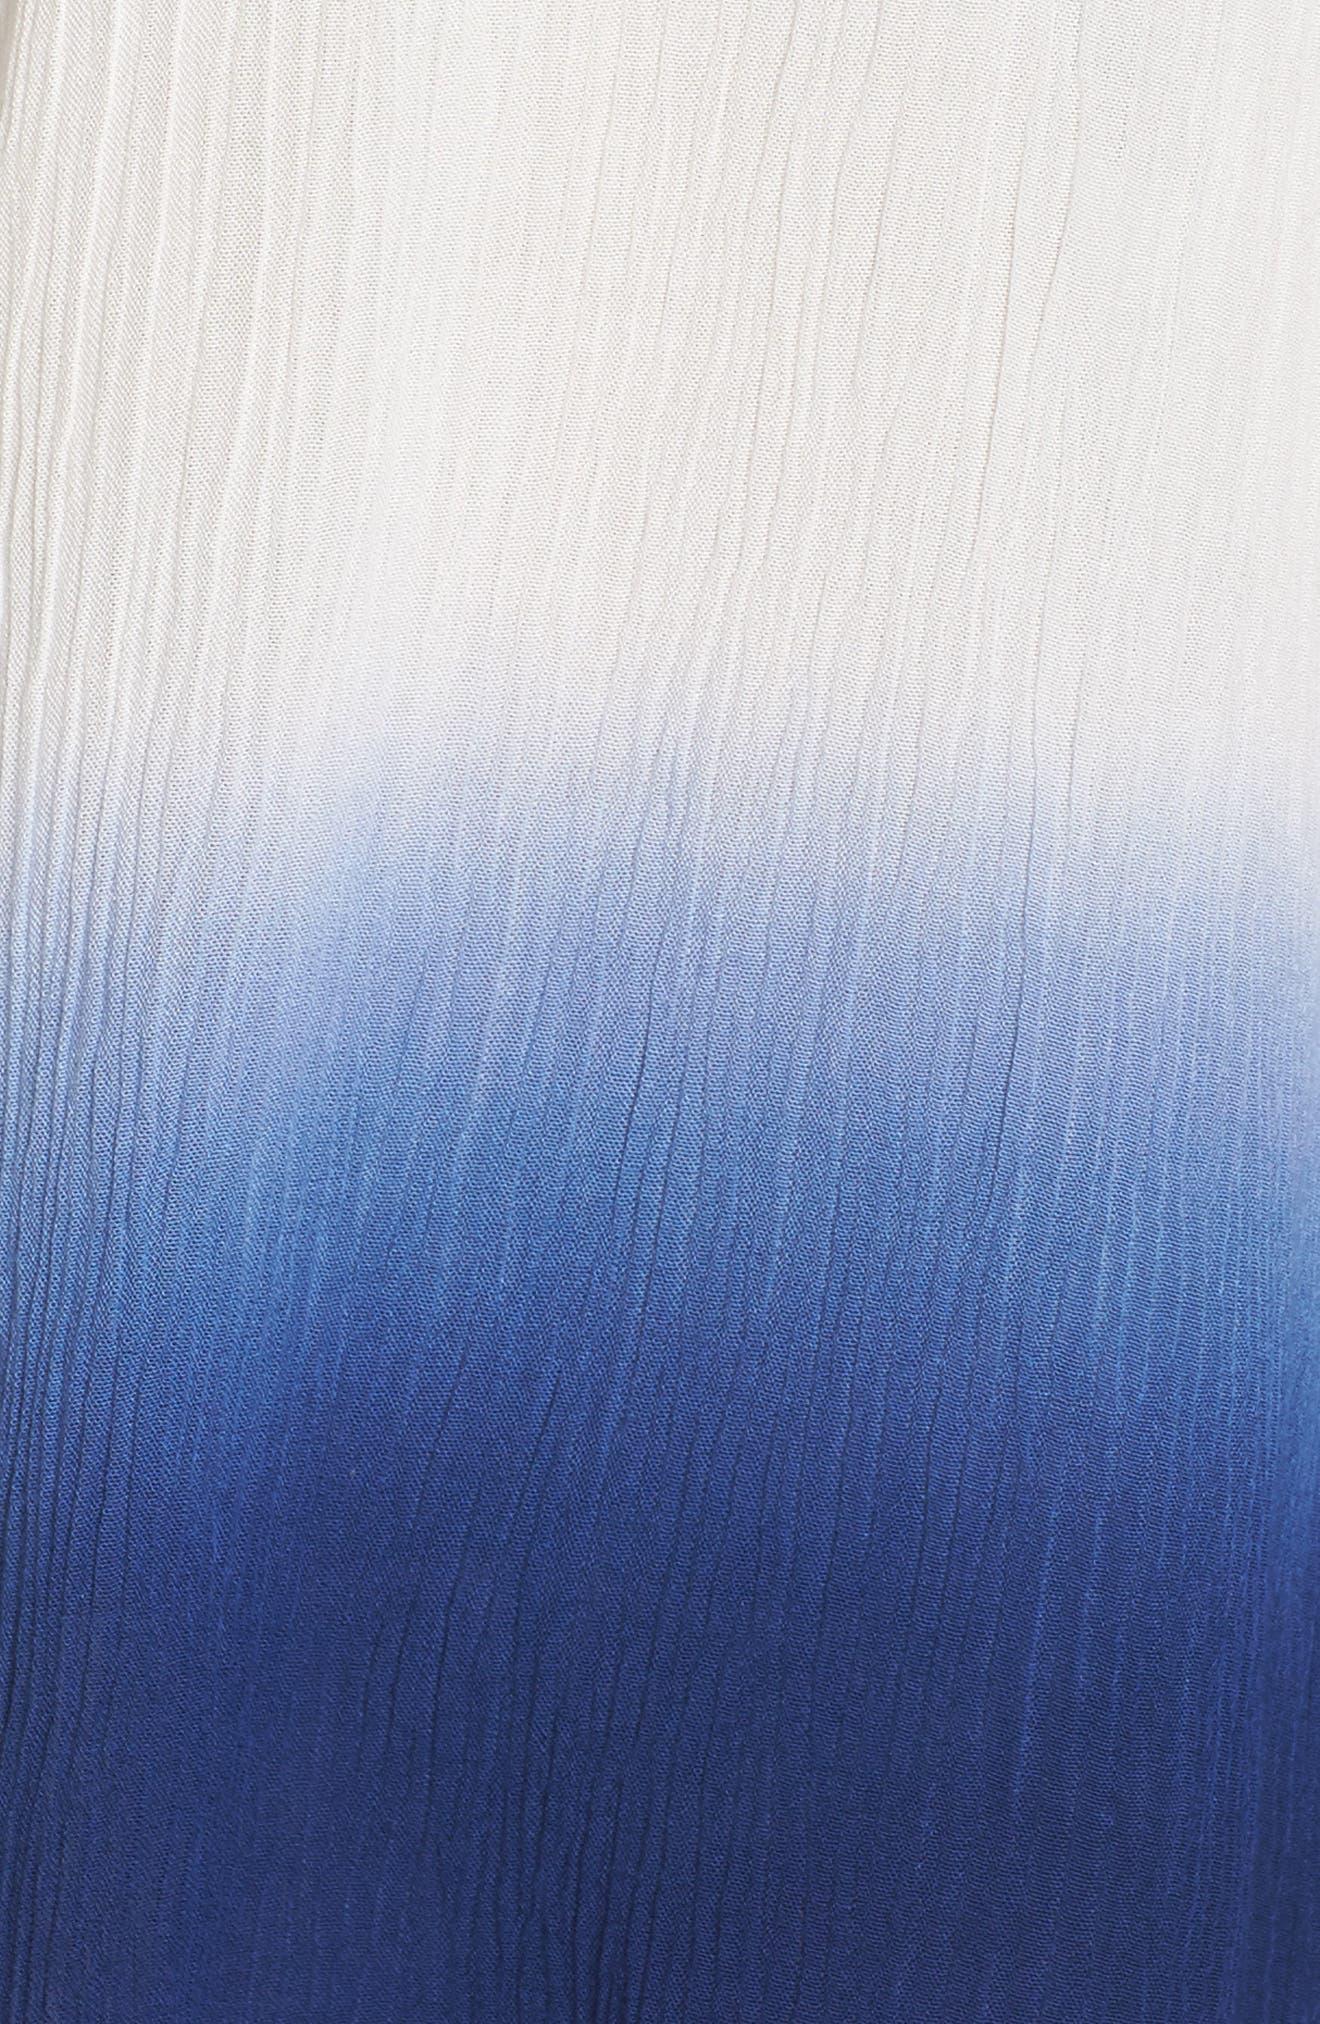 Big Sur Dip Dyed Cover-Up Boyfriend Shirt,                             Alternate thumbnail 4, color,                             Indigo